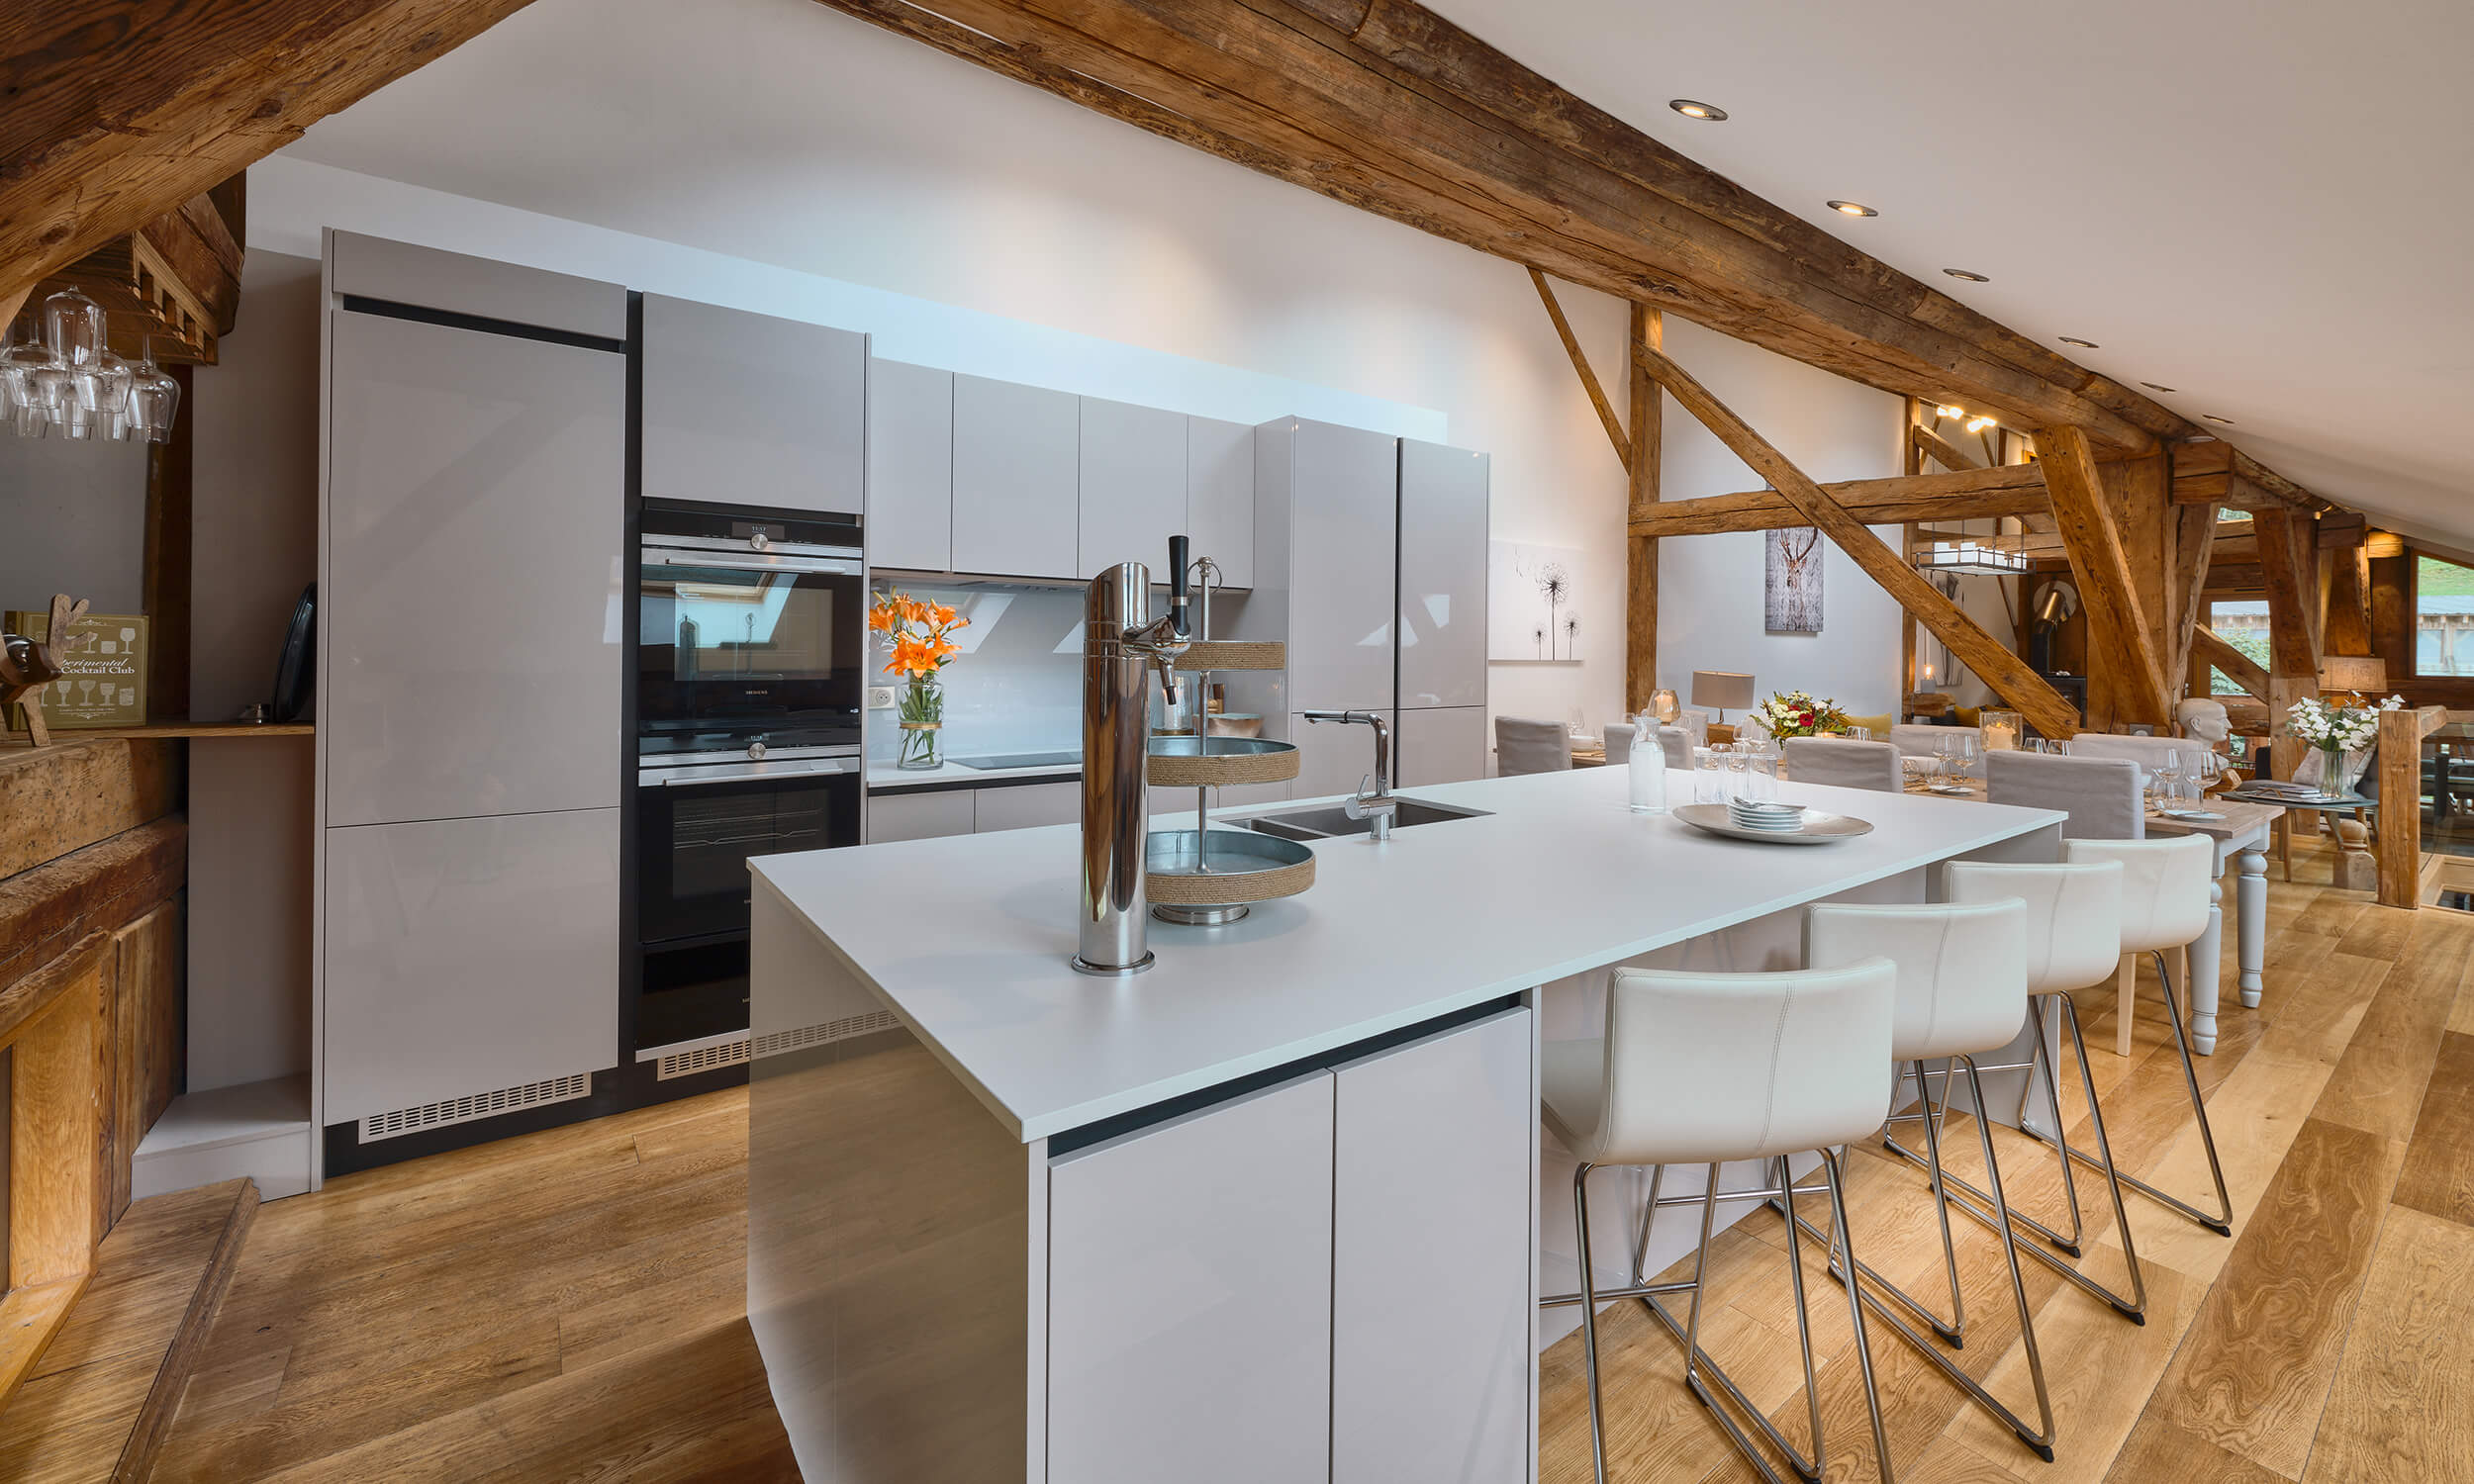 The kitchen at Chalet 46 - summer in Morzine